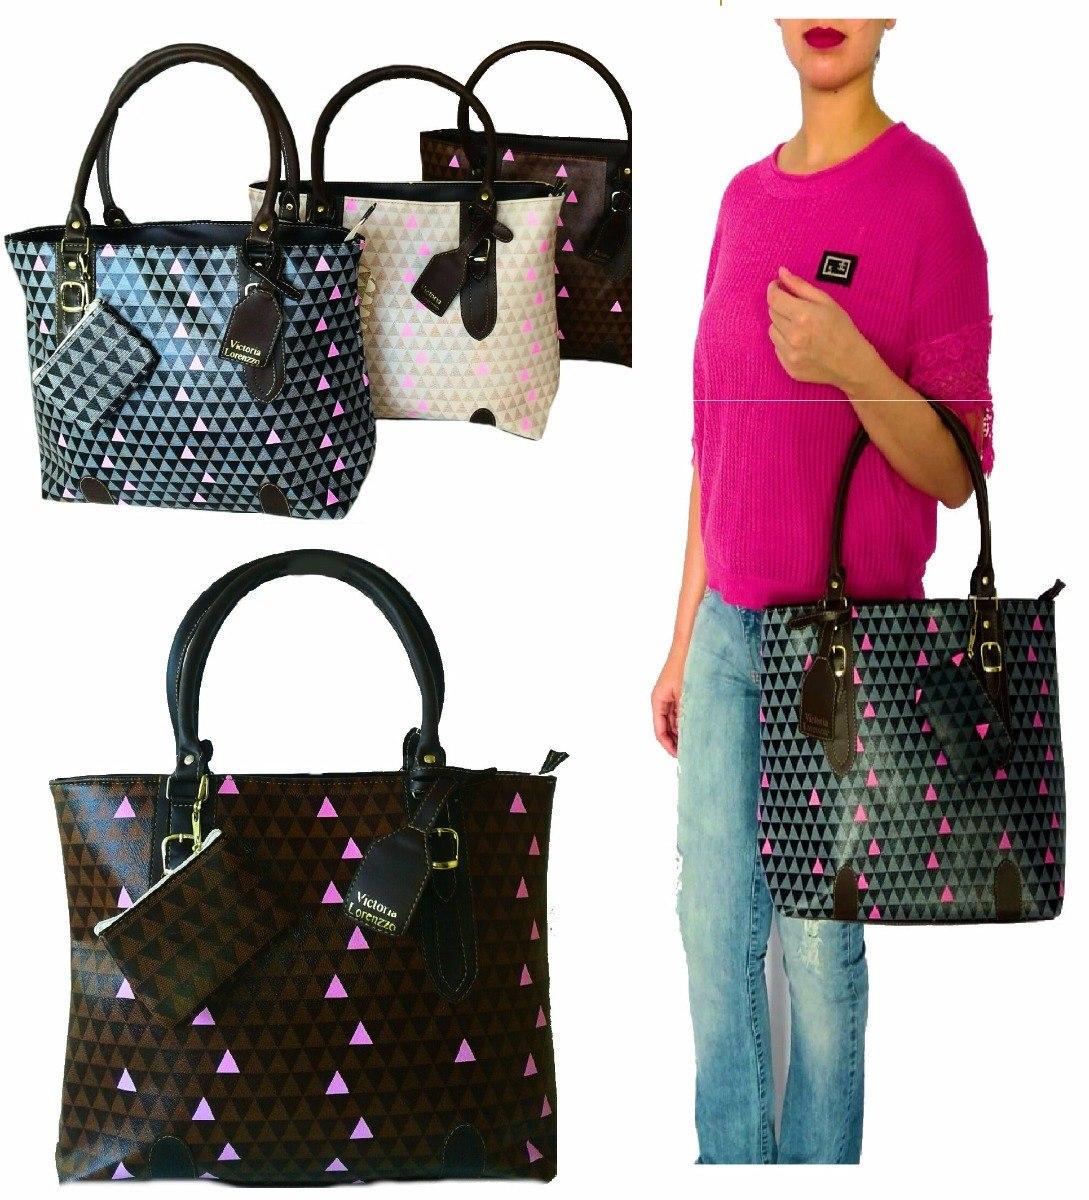 bolsa grande feminina de marca famosa grife importada sacola. Carregando  zoom. 61eecd9ecc3